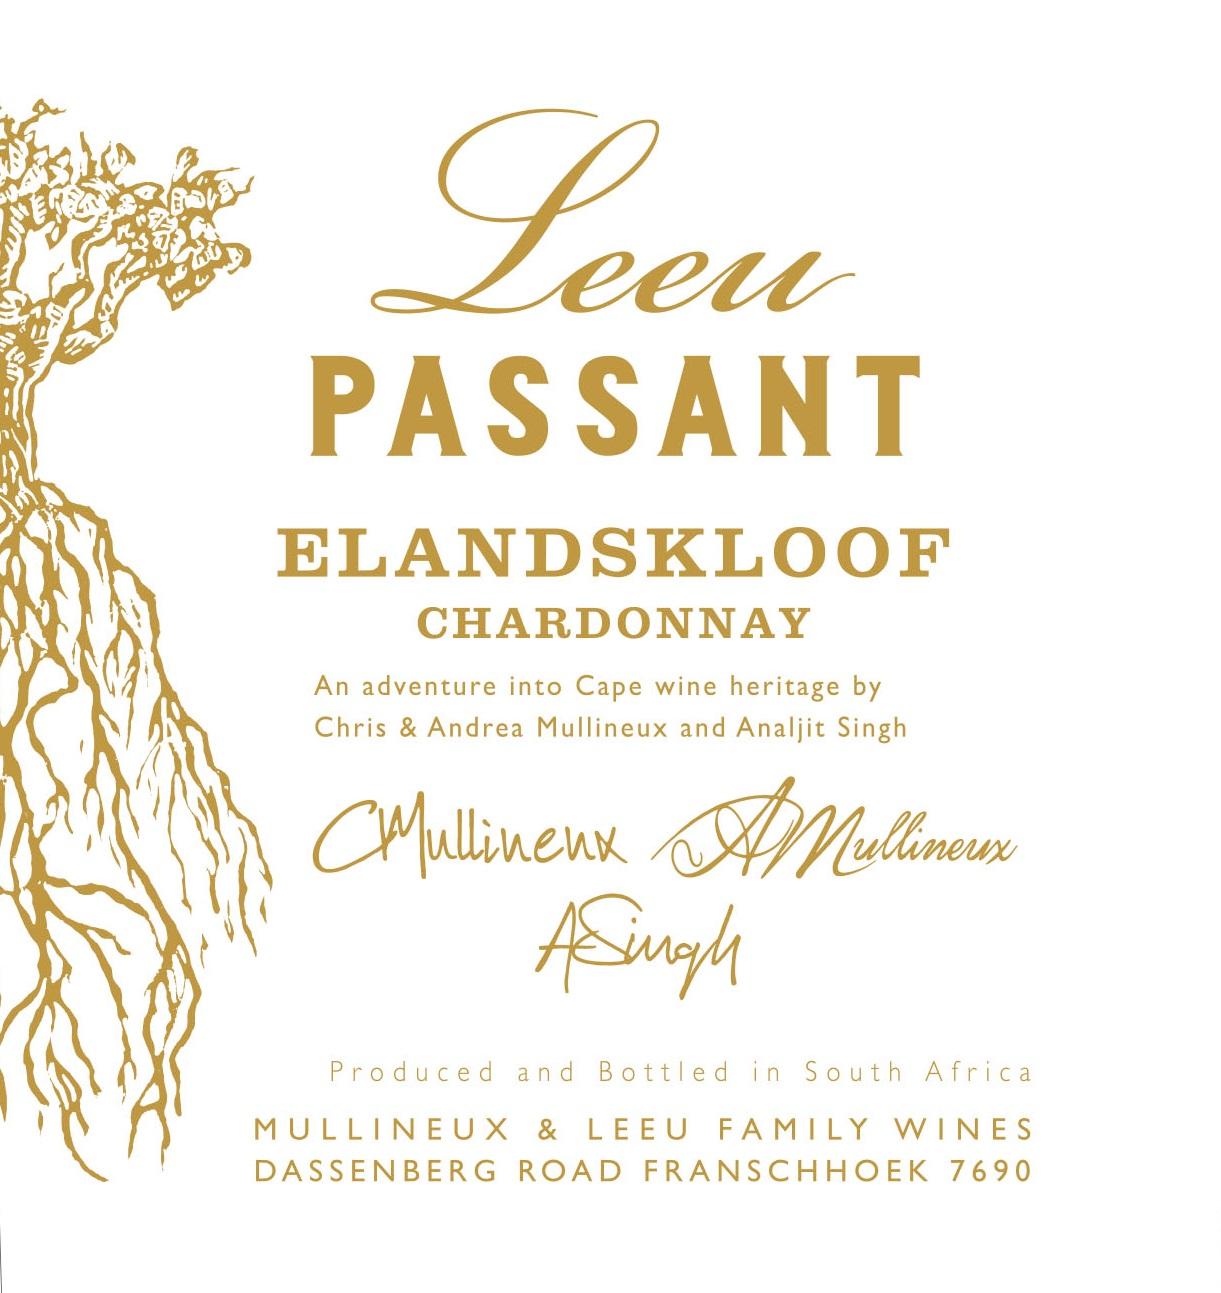 Passant Chard Eland Brand